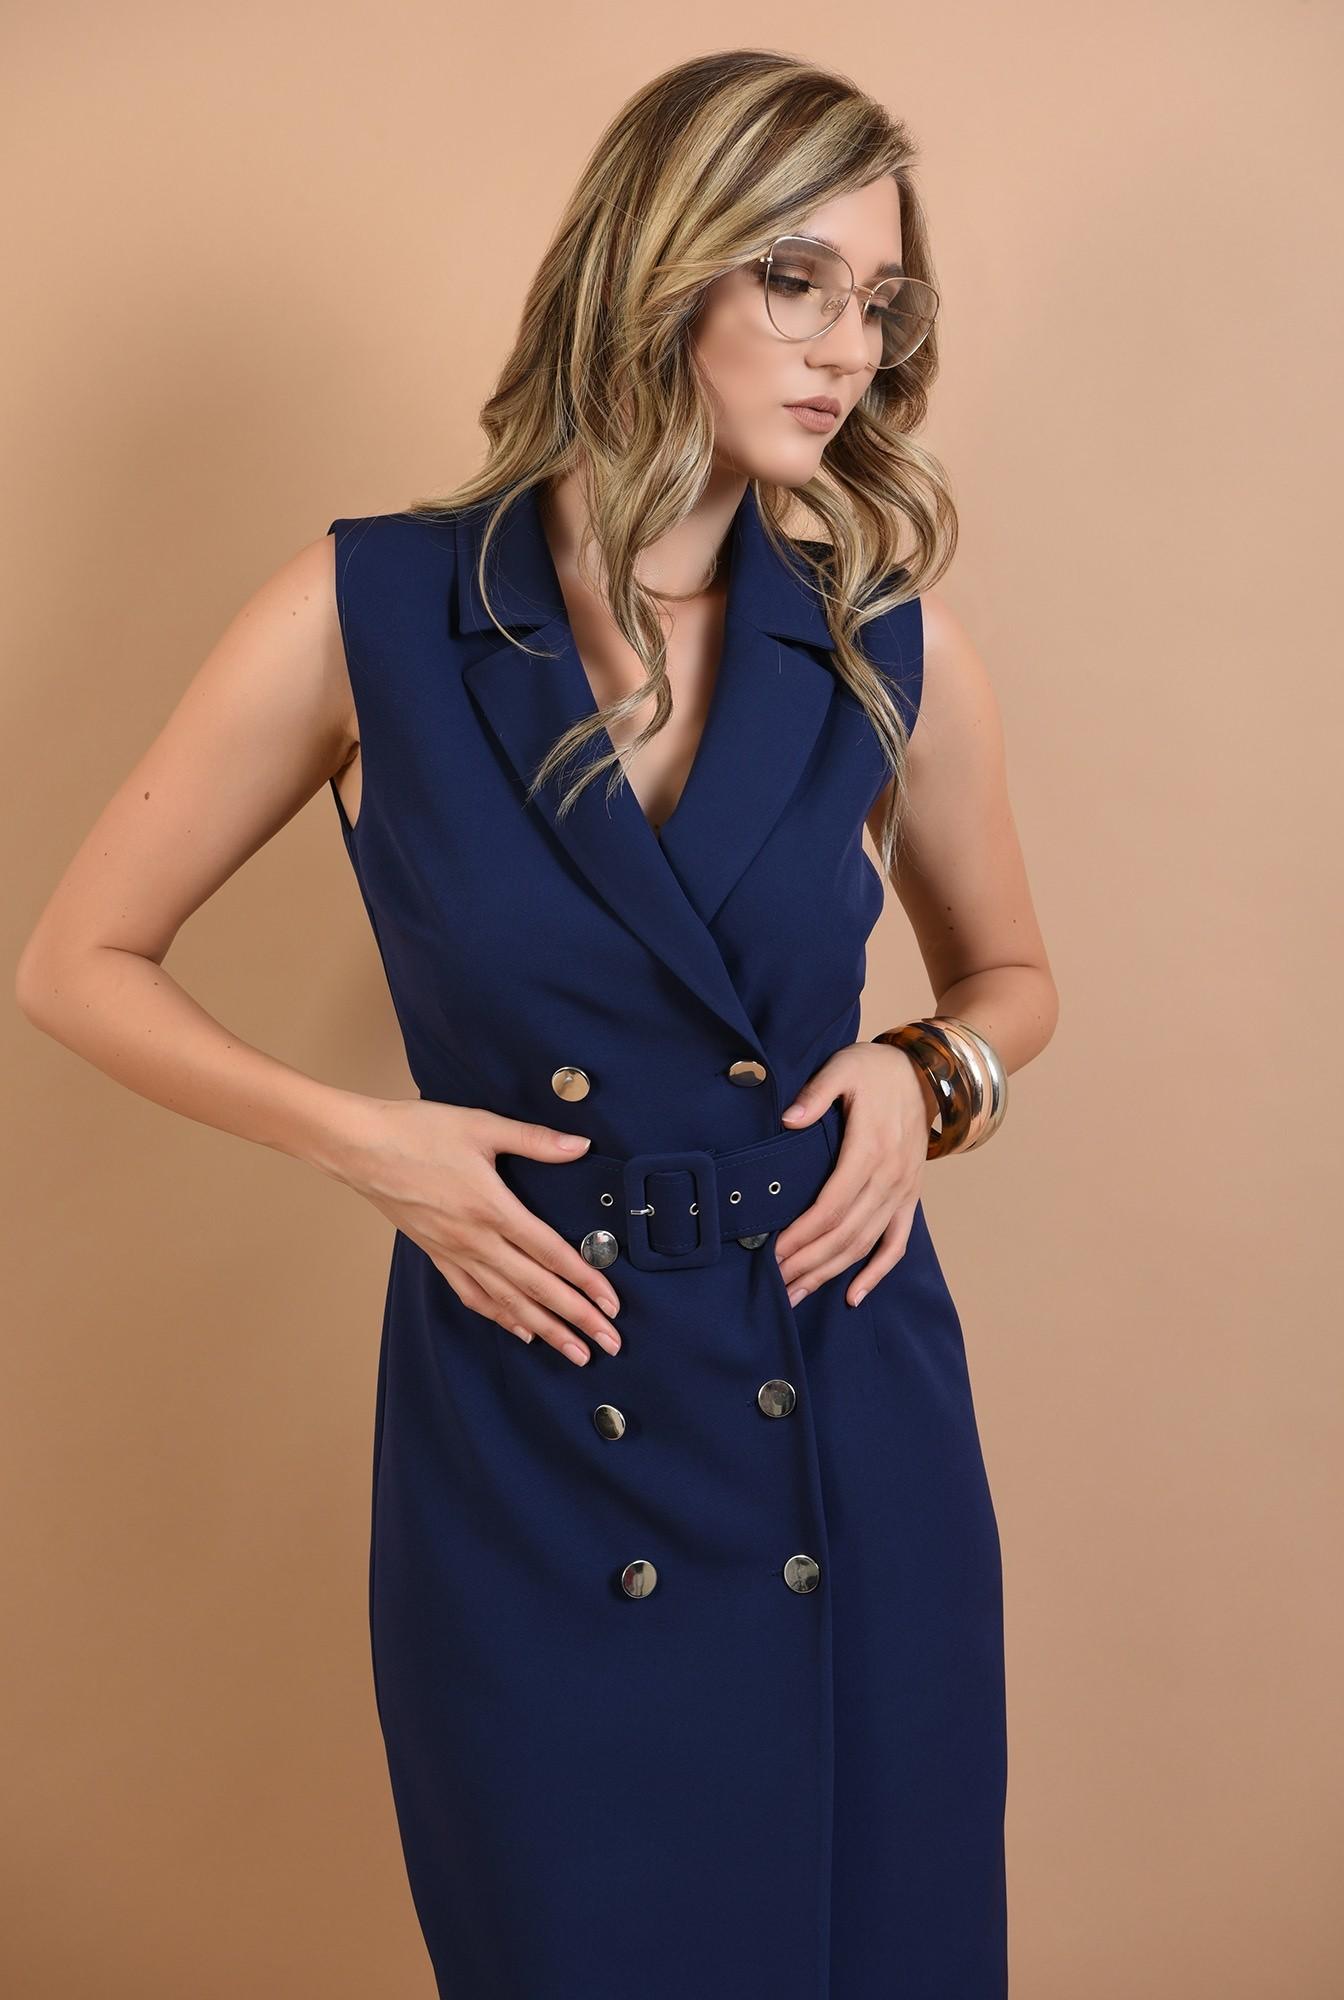 2 - 360 - rochie conica, bleumarin, cu nasturi, stil sacou, Poema